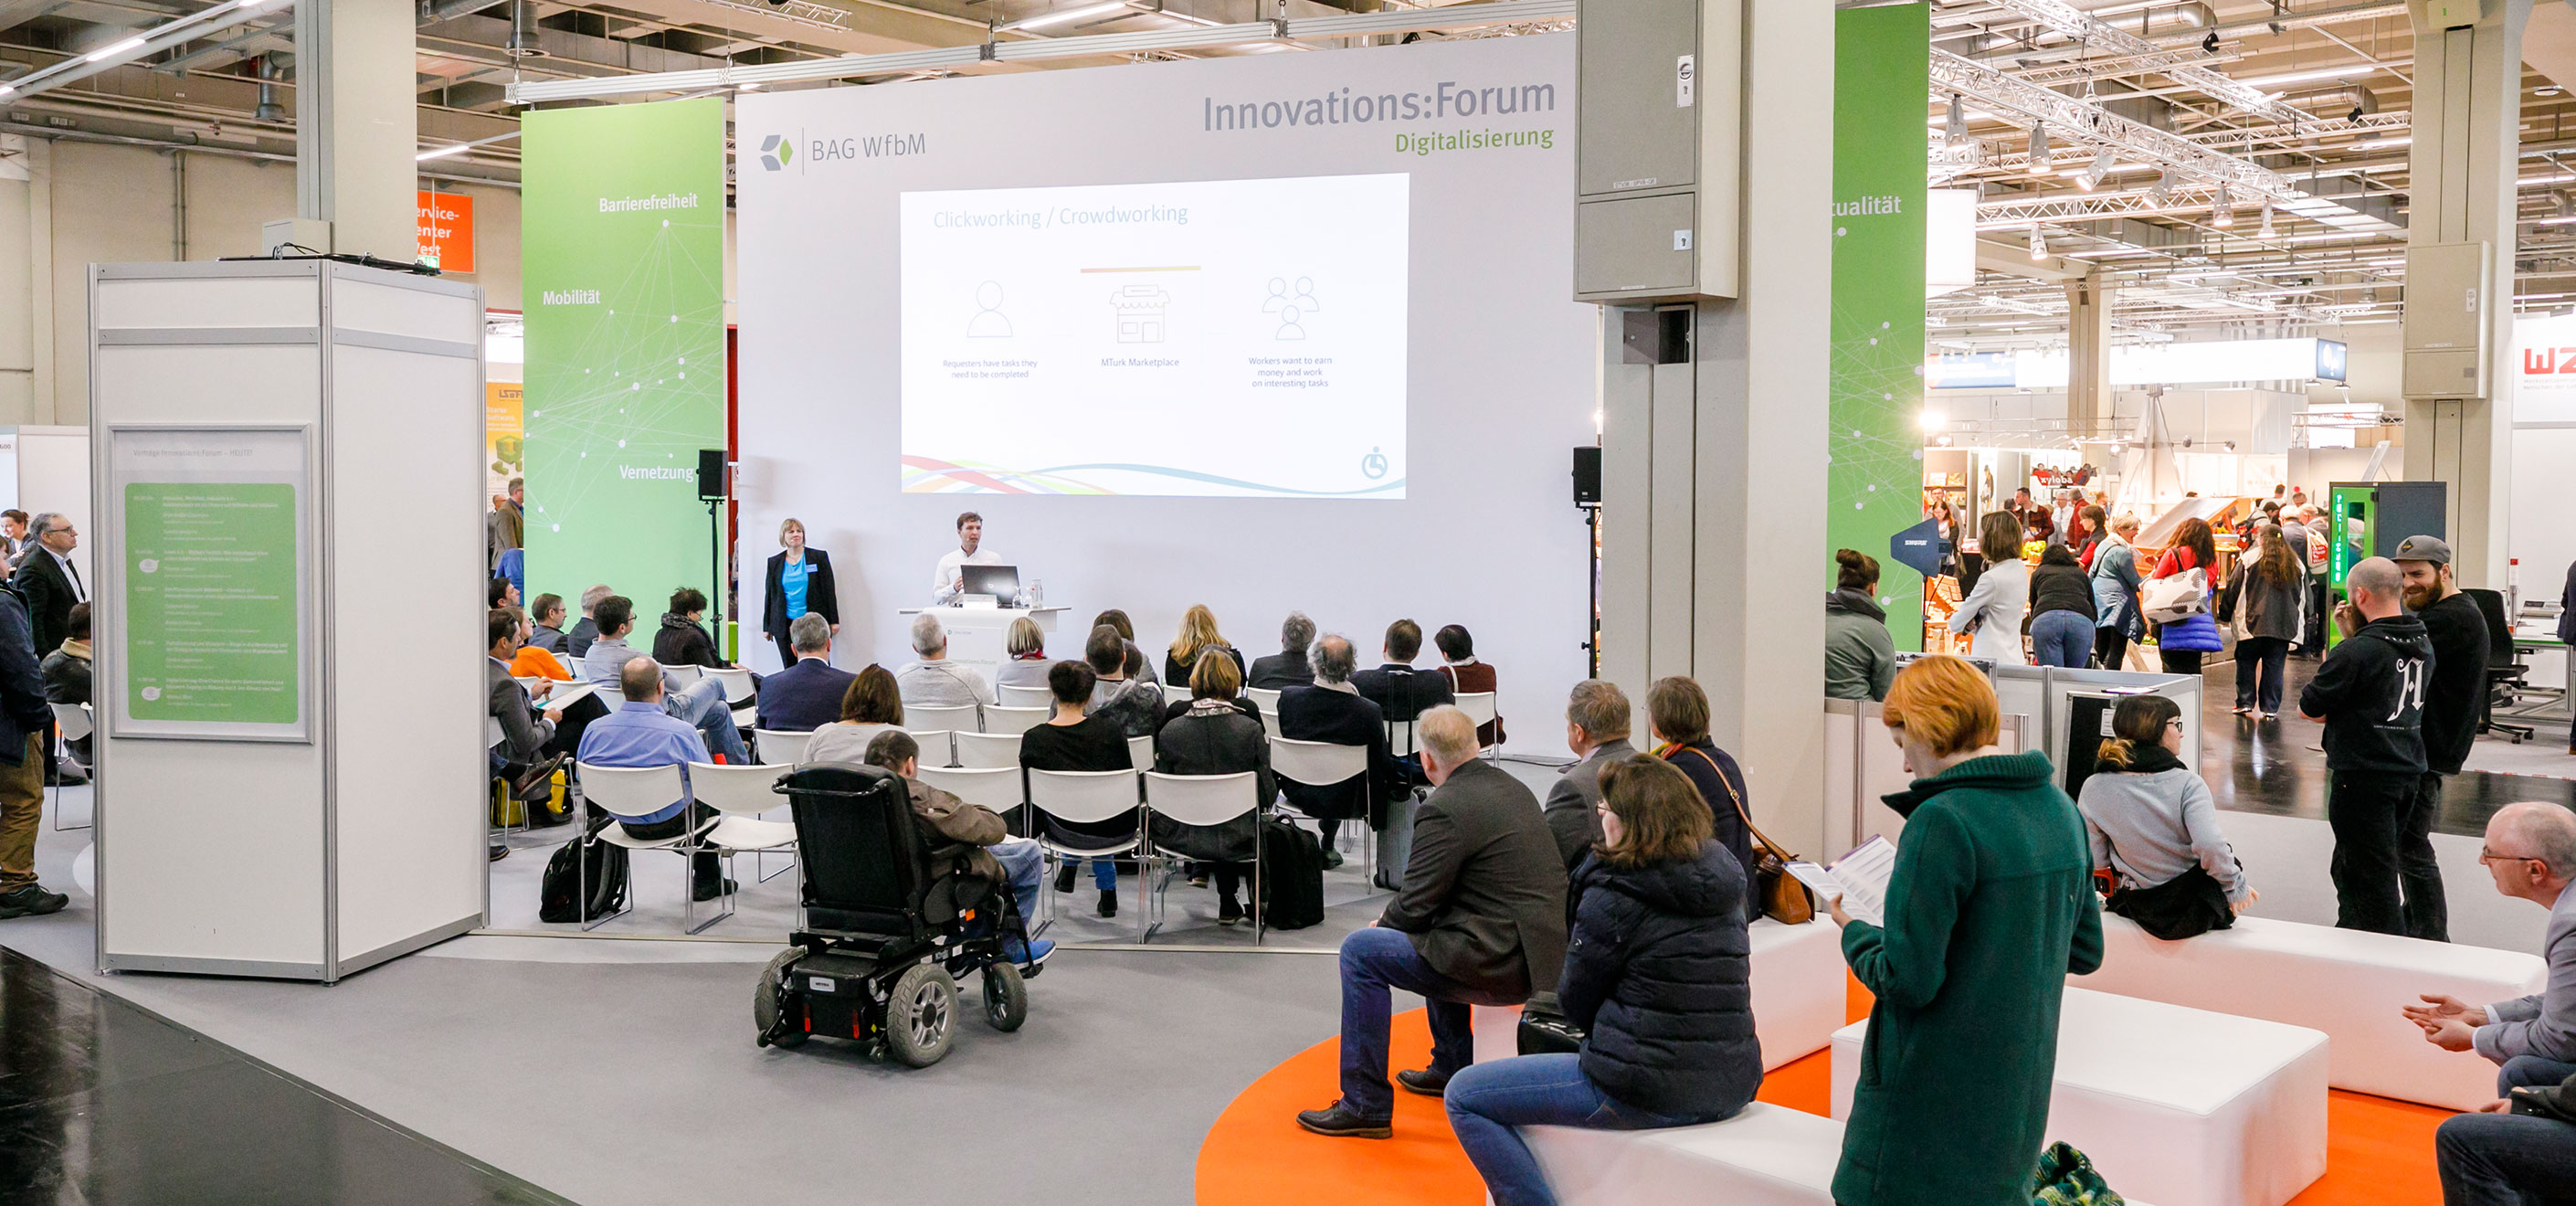 Rückblick Werkstätten:Messe 2020 - Innovations:Forum